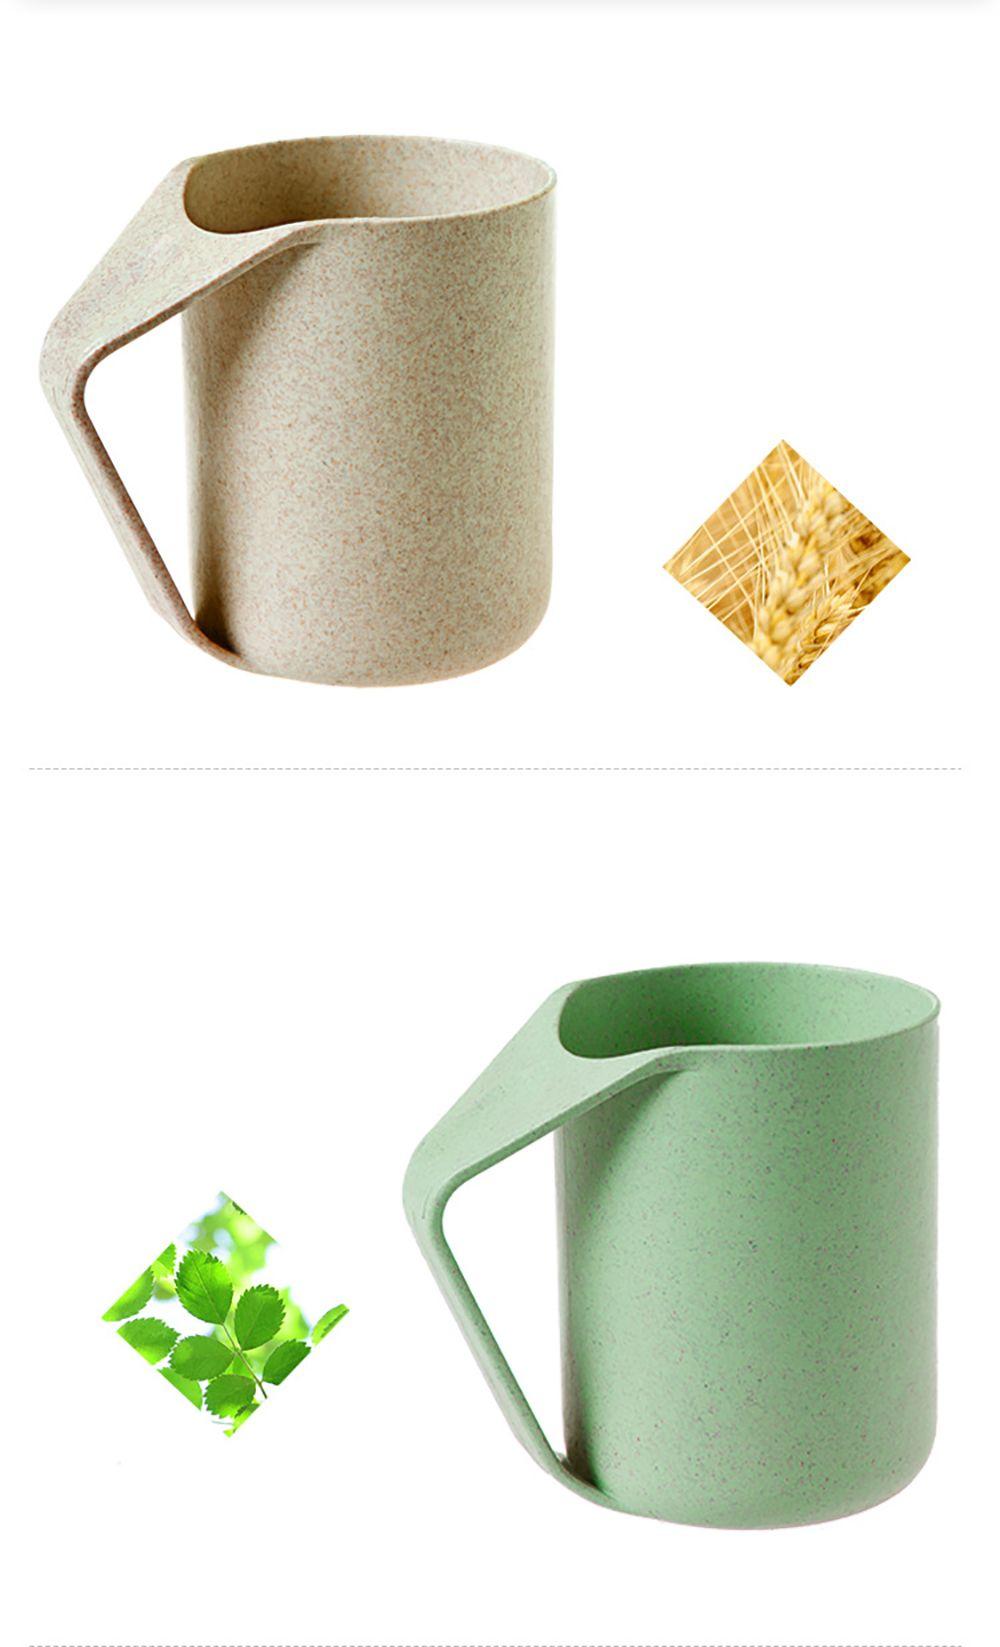 Atongm Wheat Straw Washing Cup